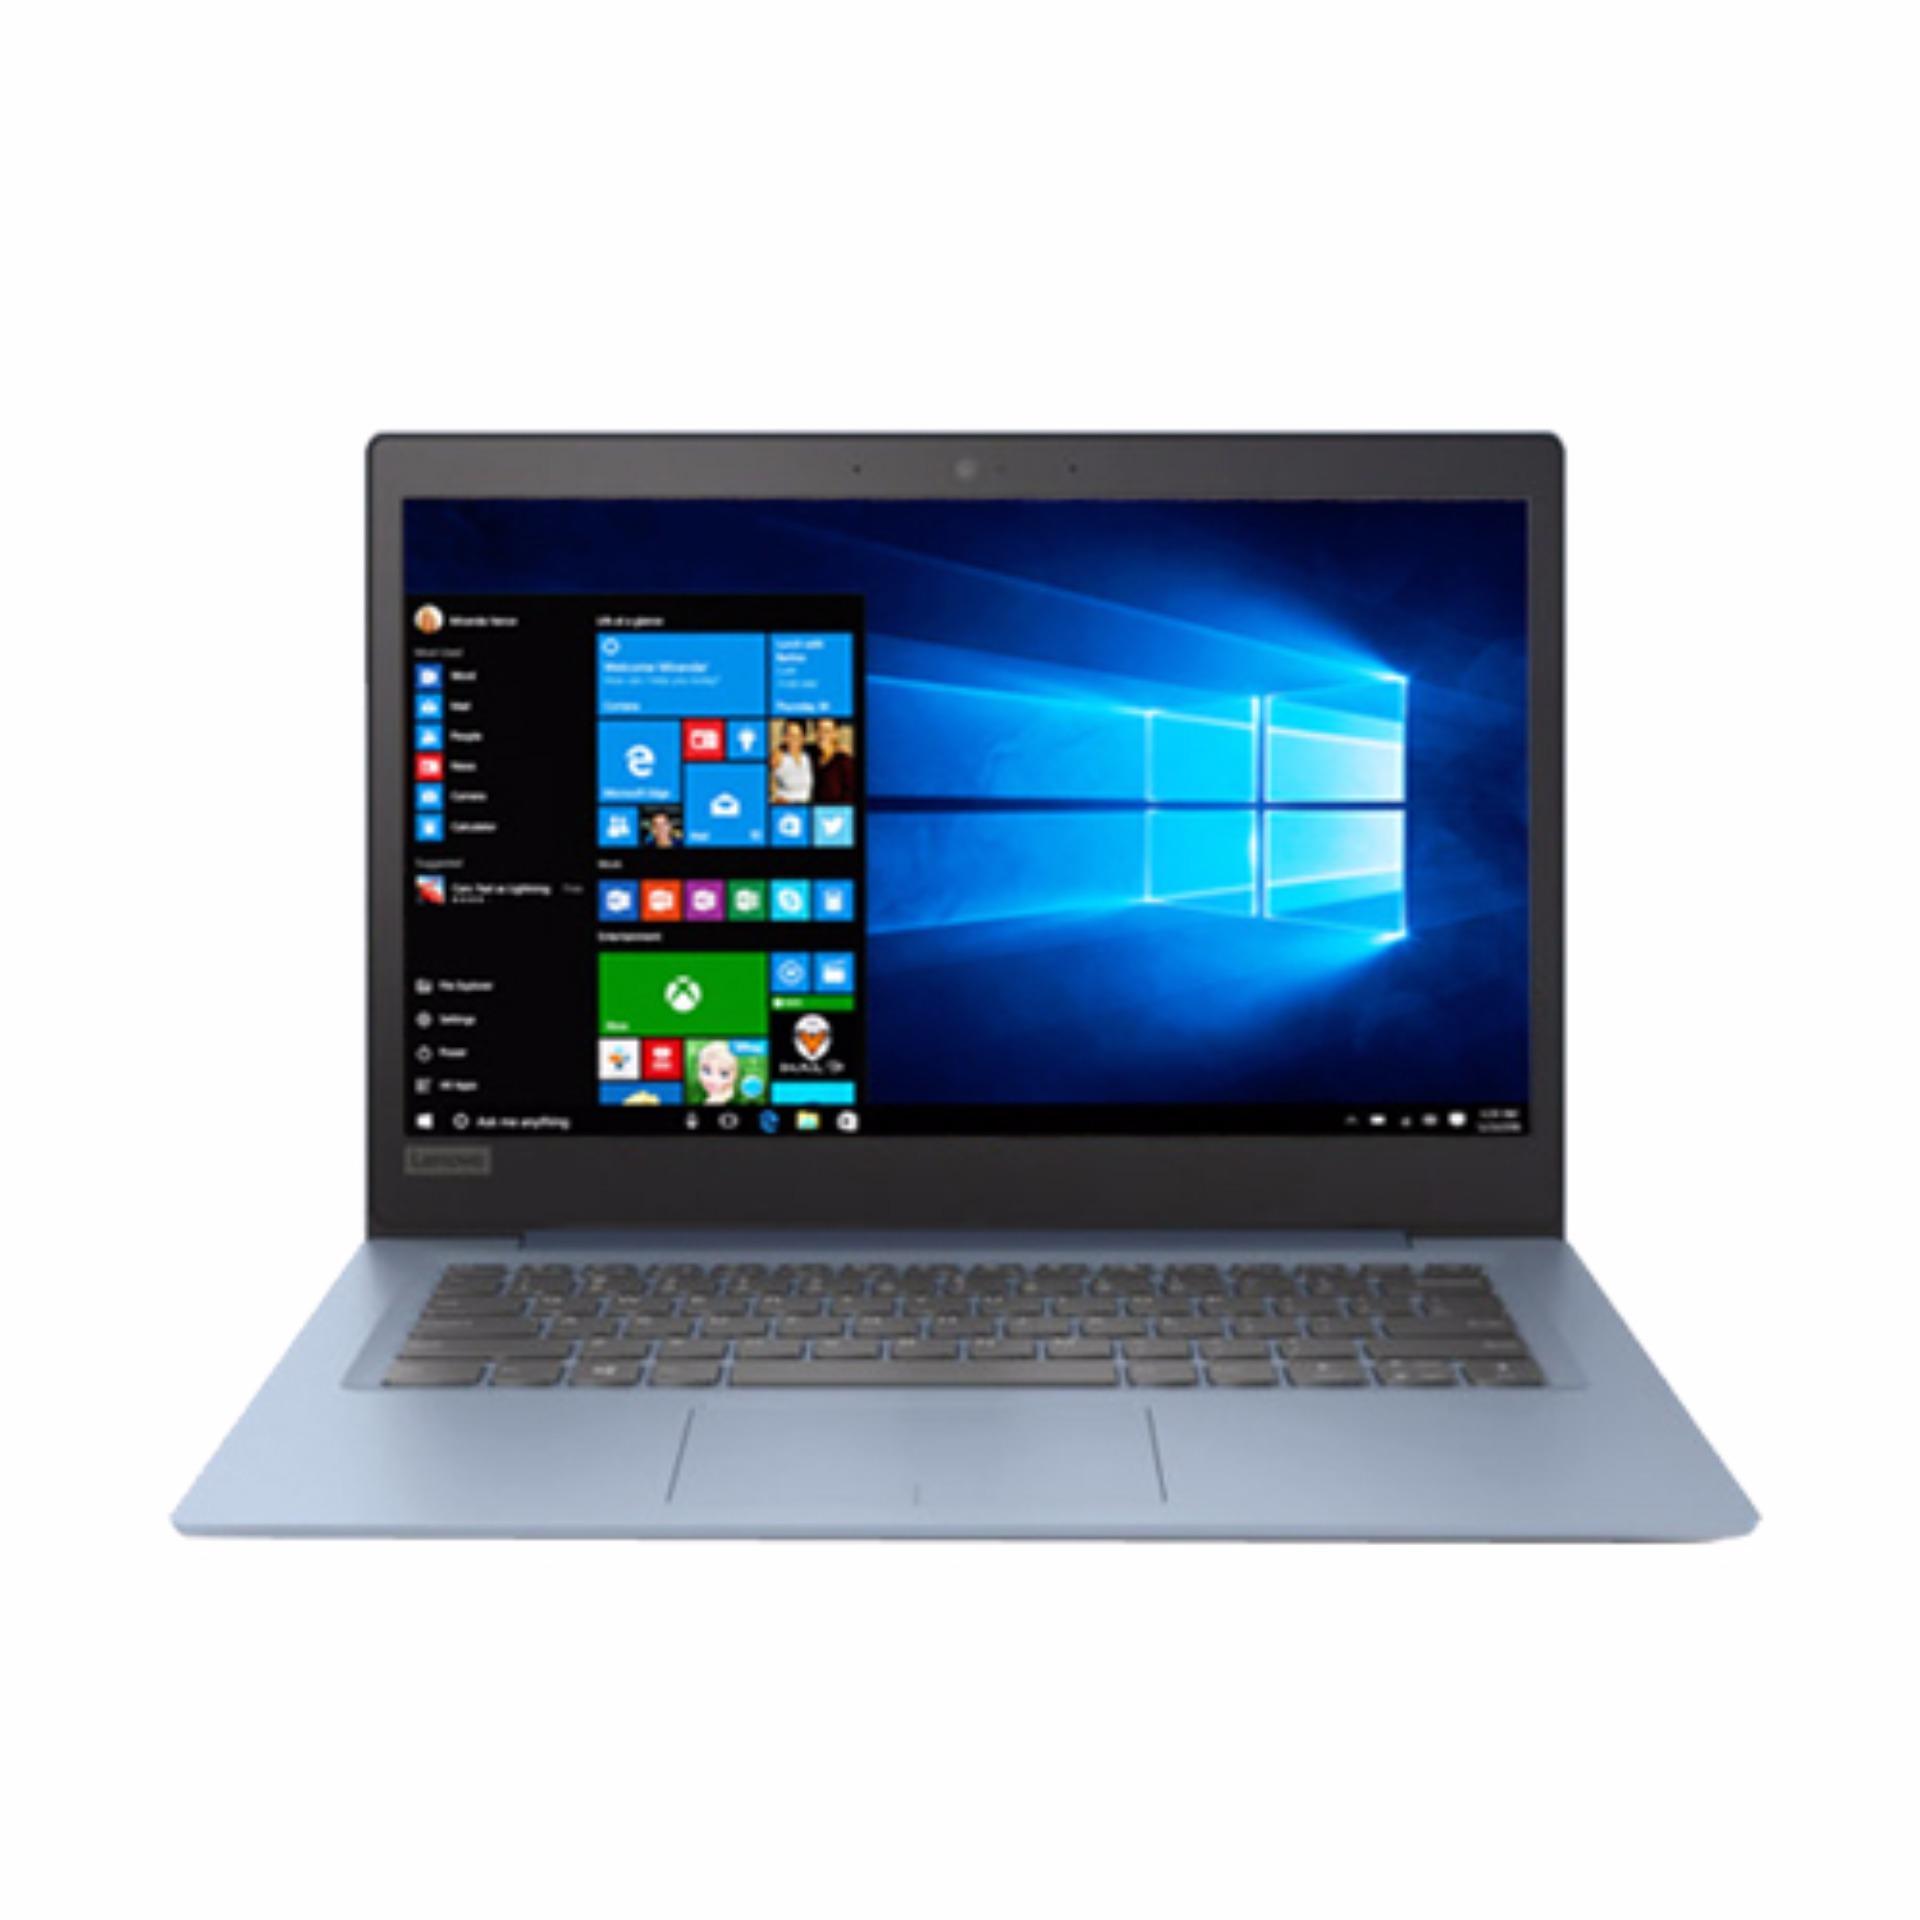 LENOVO Ideapad 120S-3TID | Layar 11.6 HD | Intel Celeron N3350 | 2GB | 500GB | WIN 10 | Denim Blue